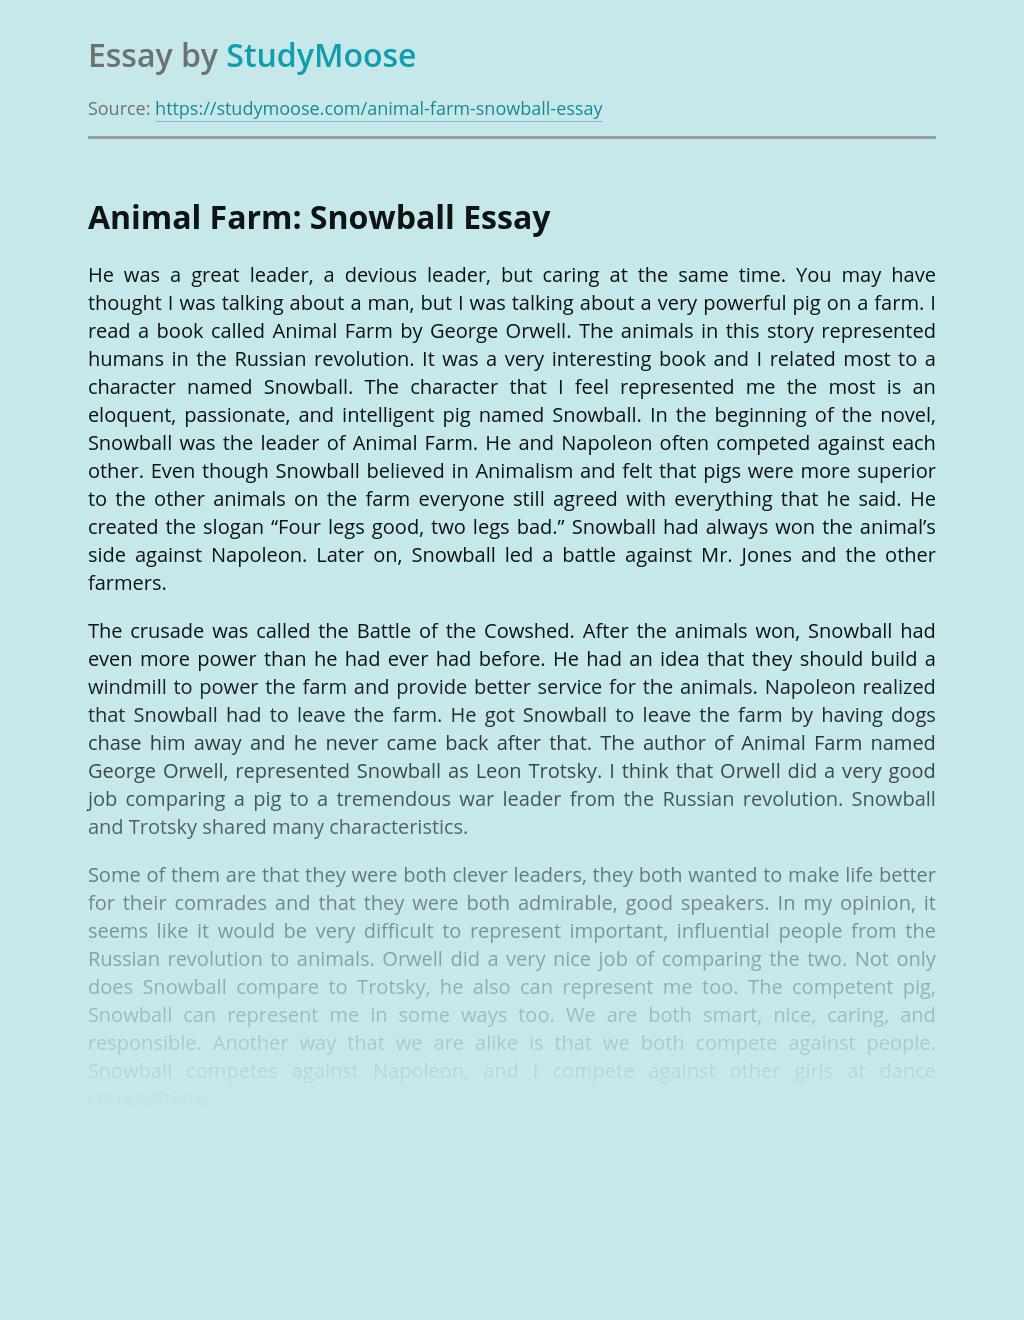 Animal Farm: Snowball